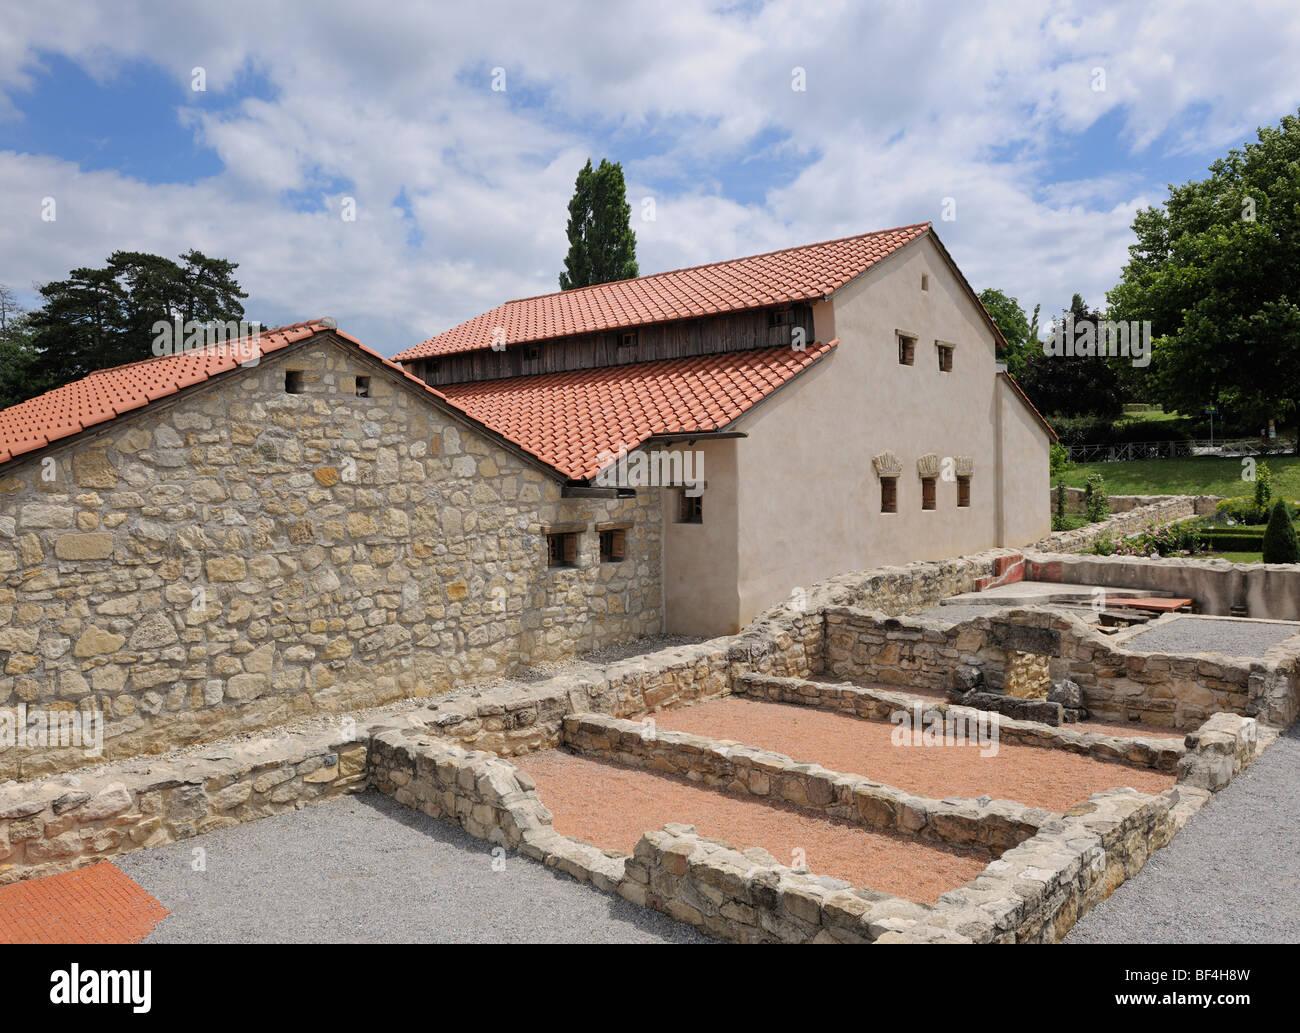 City palace reconstruction Villa Urbana, Carnuntum, Lower Austria, Austria, Europe - Stock Image